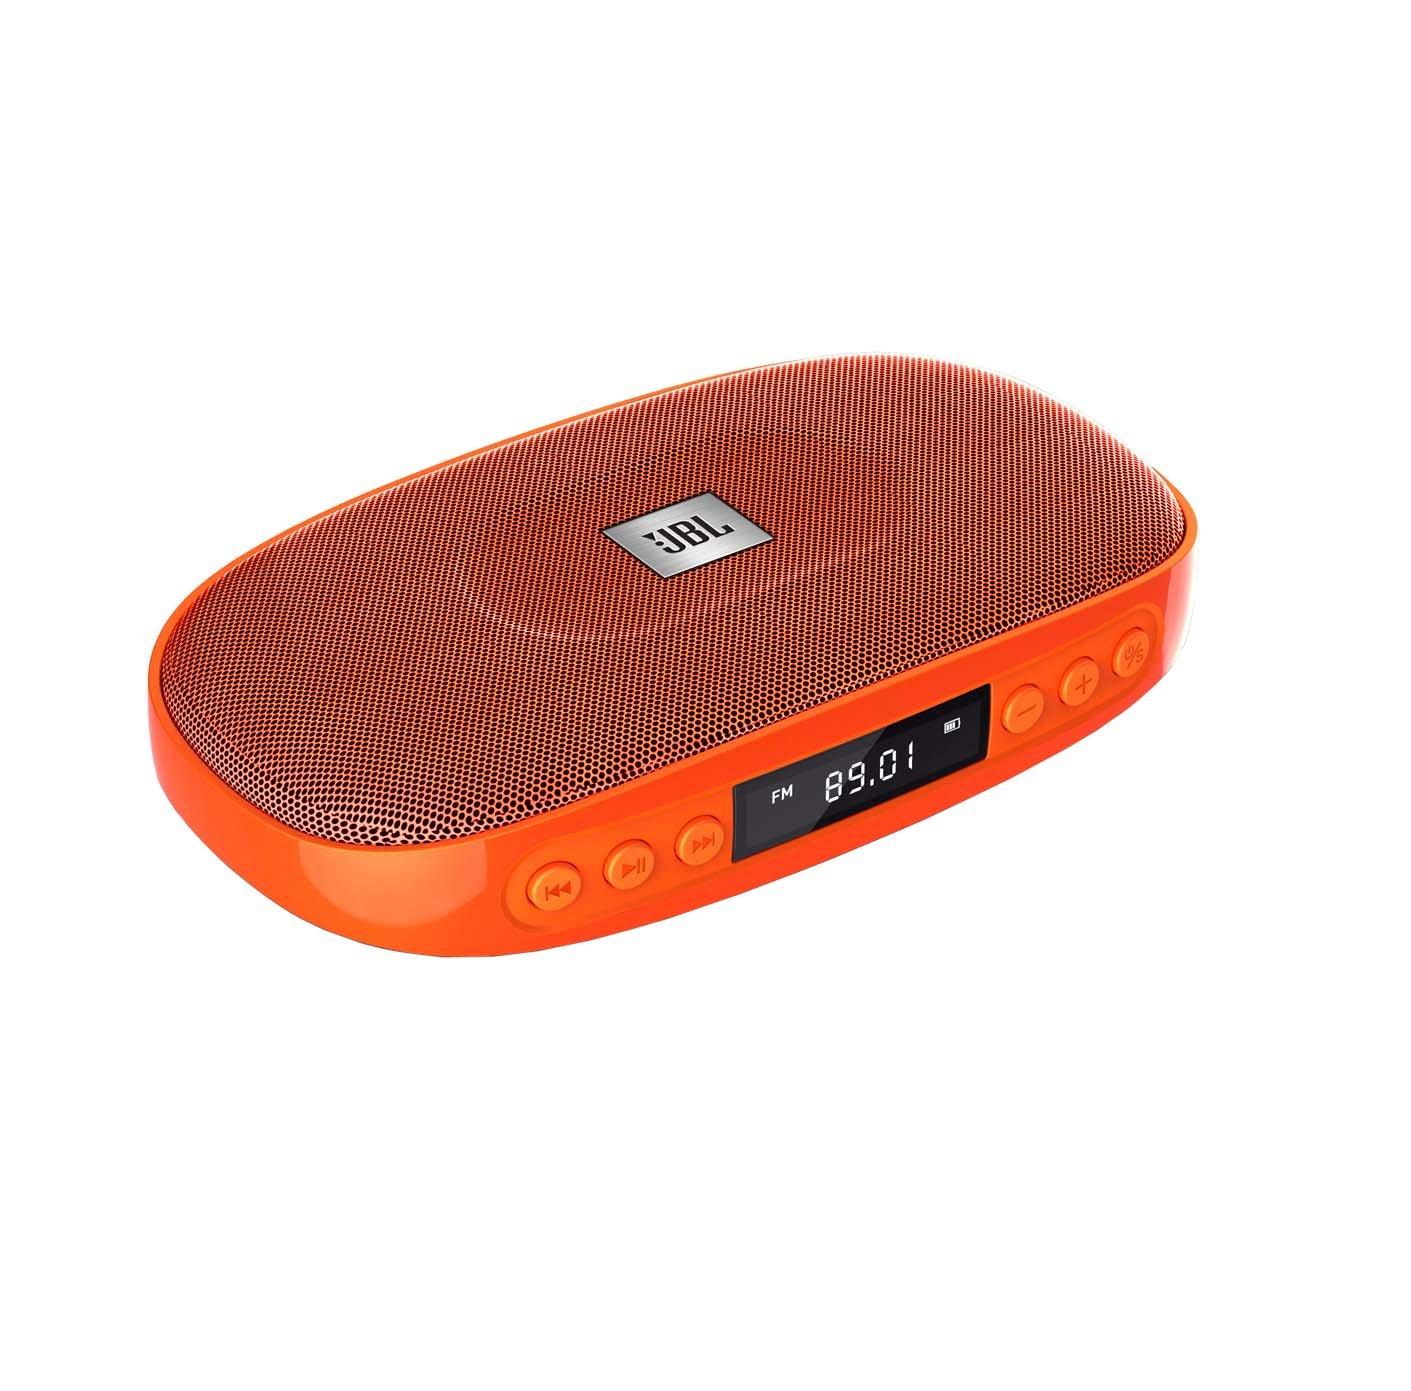 JBL Tune (ORANGE) Wireless Bluetooth Speaker